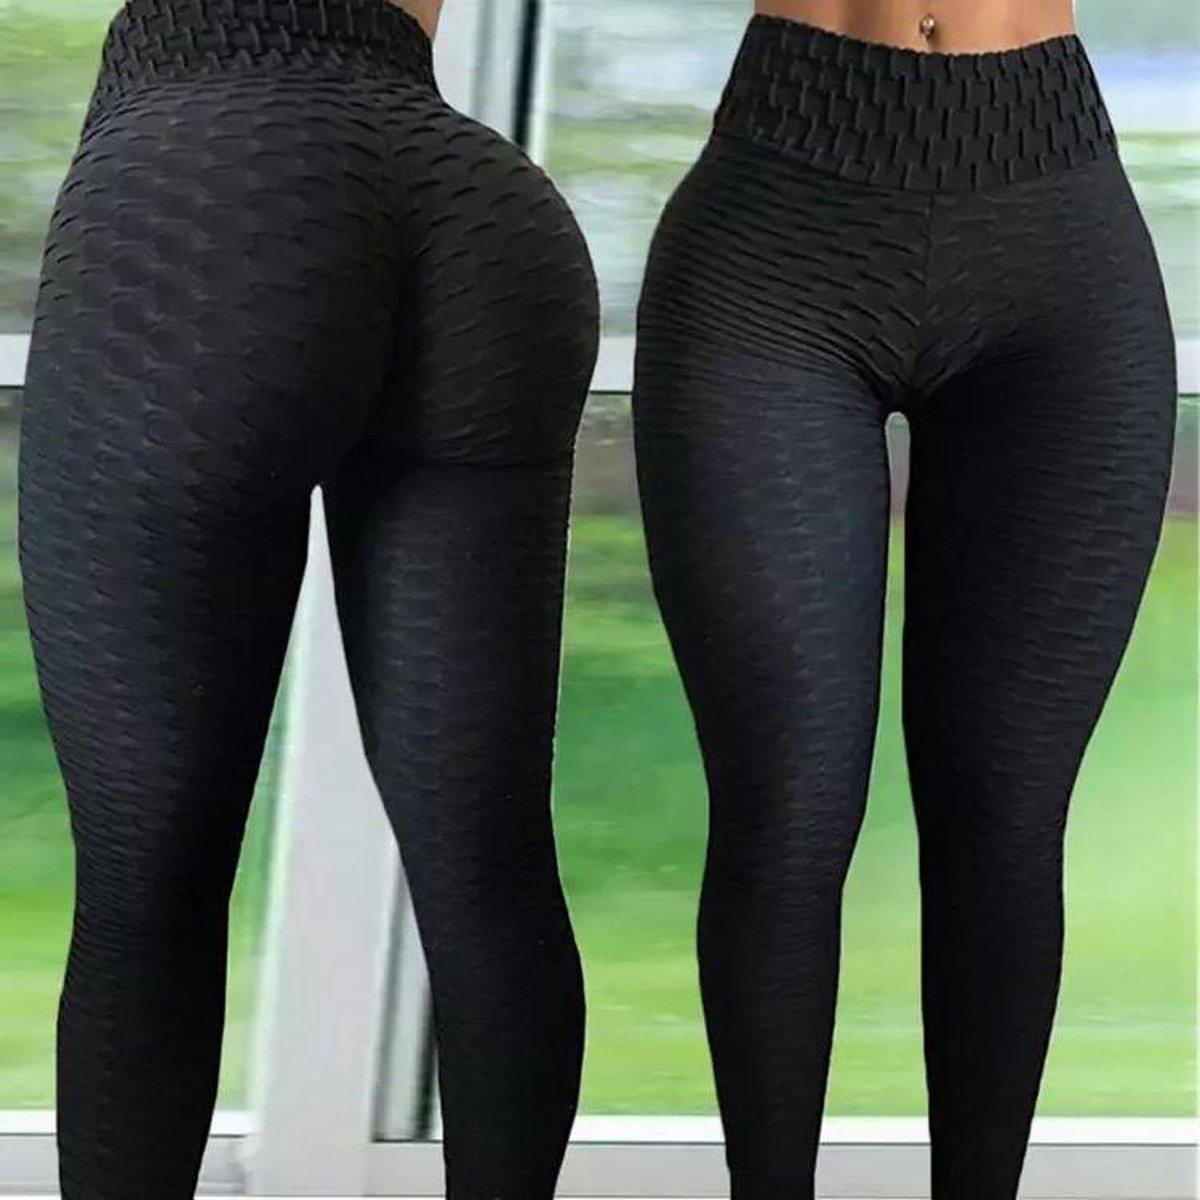 LOUZIR Sportlegging-Yoga -Scrunch Butt-High Waist- Absorberend- Anti Cellulite Legging-Gym Sports -L